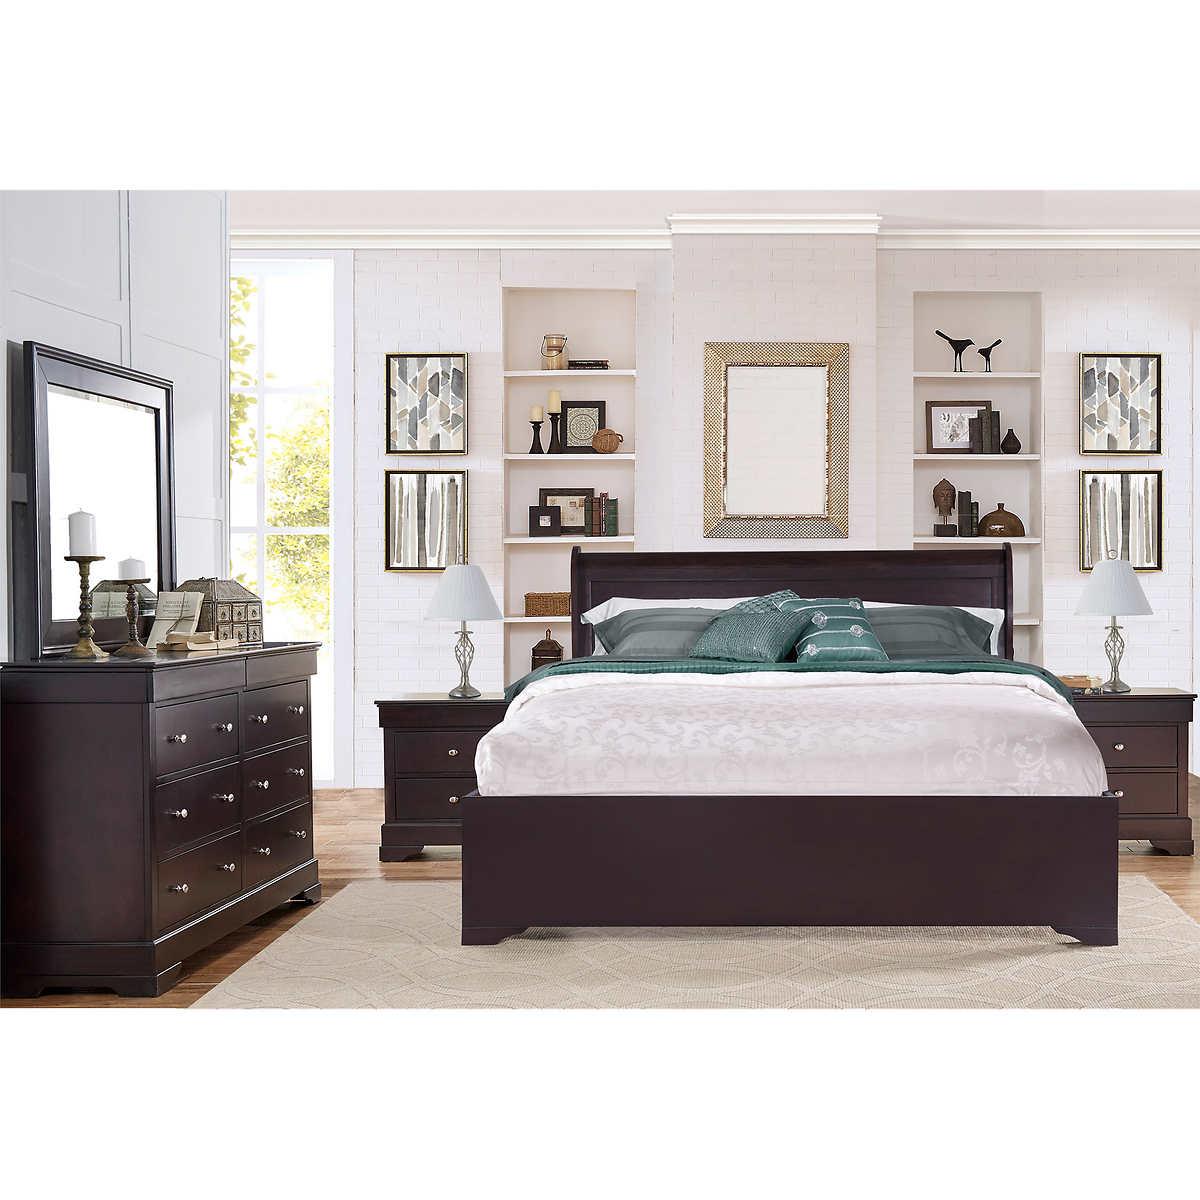 Carolyn 5 piece King Bedroom Set